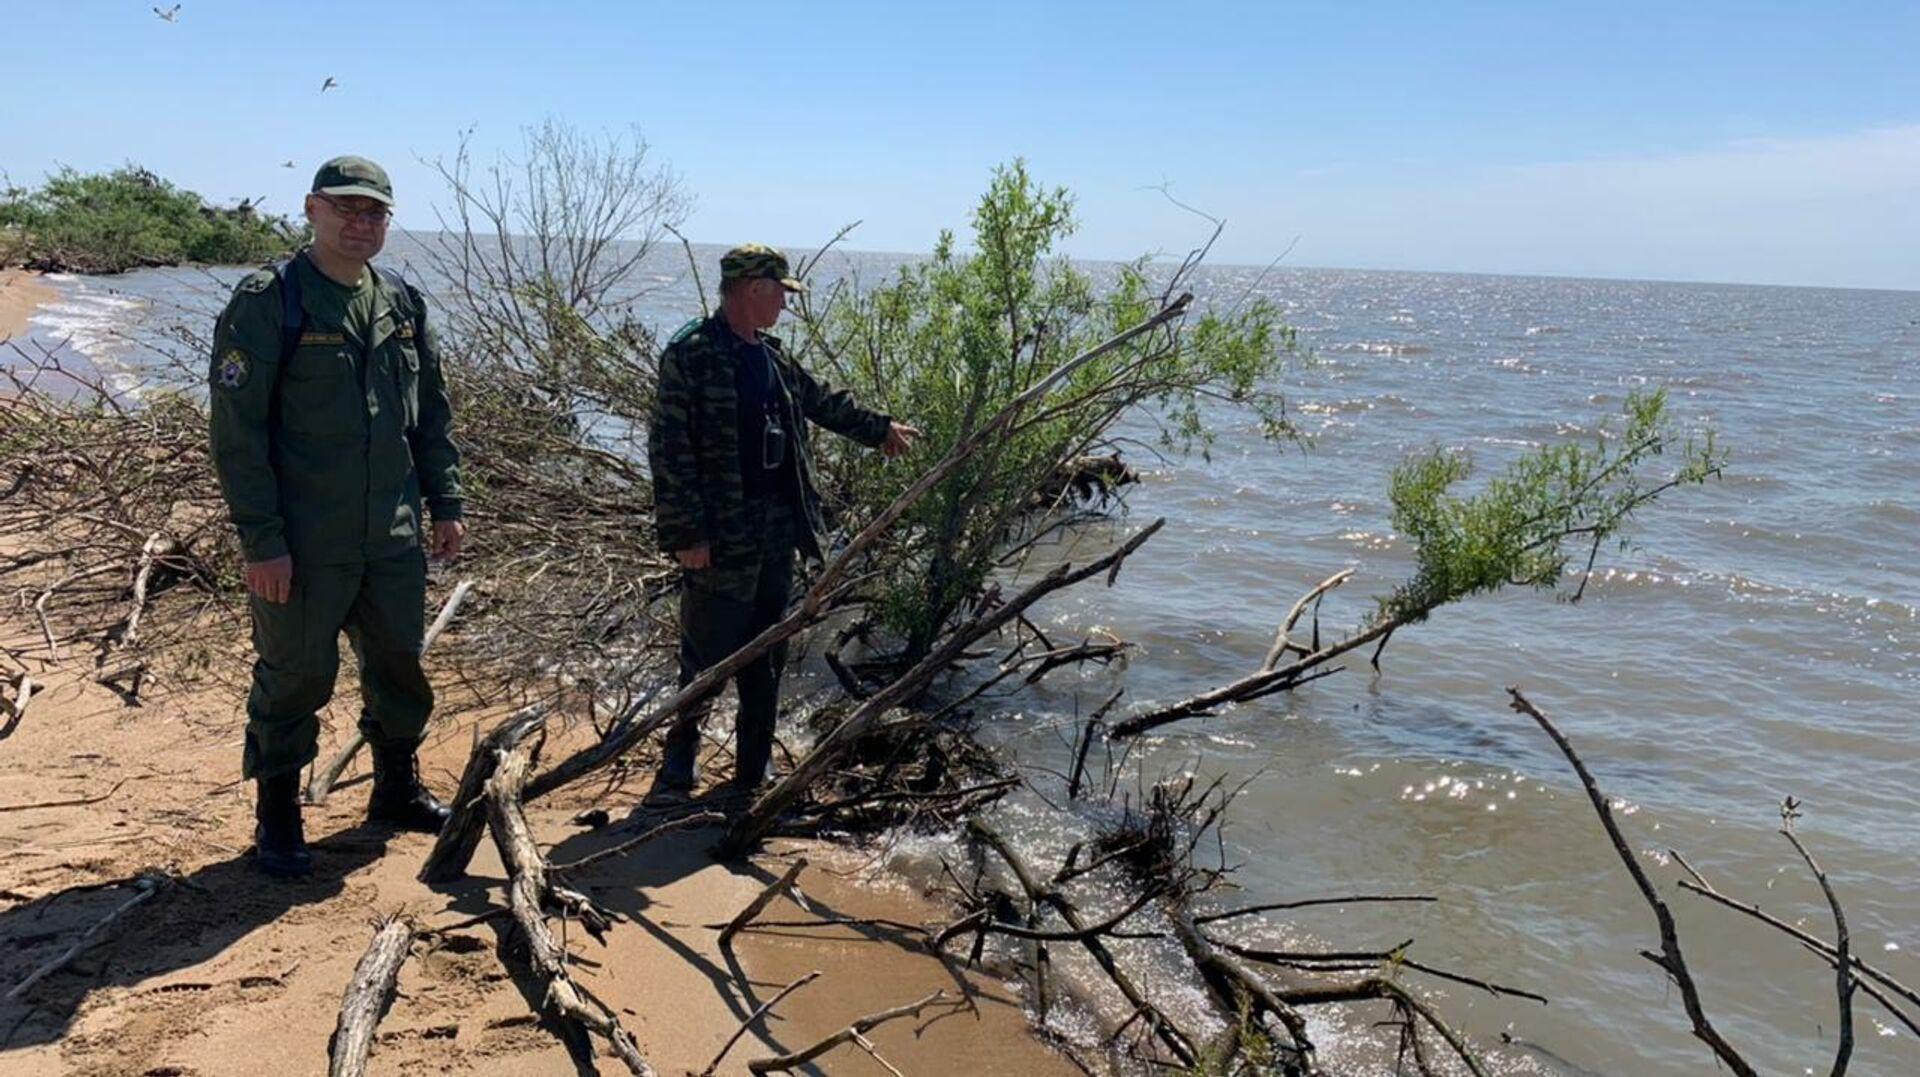 Место, где обнаружили лодку с ребенком - РИА Новости, 1920, 16.06.2021